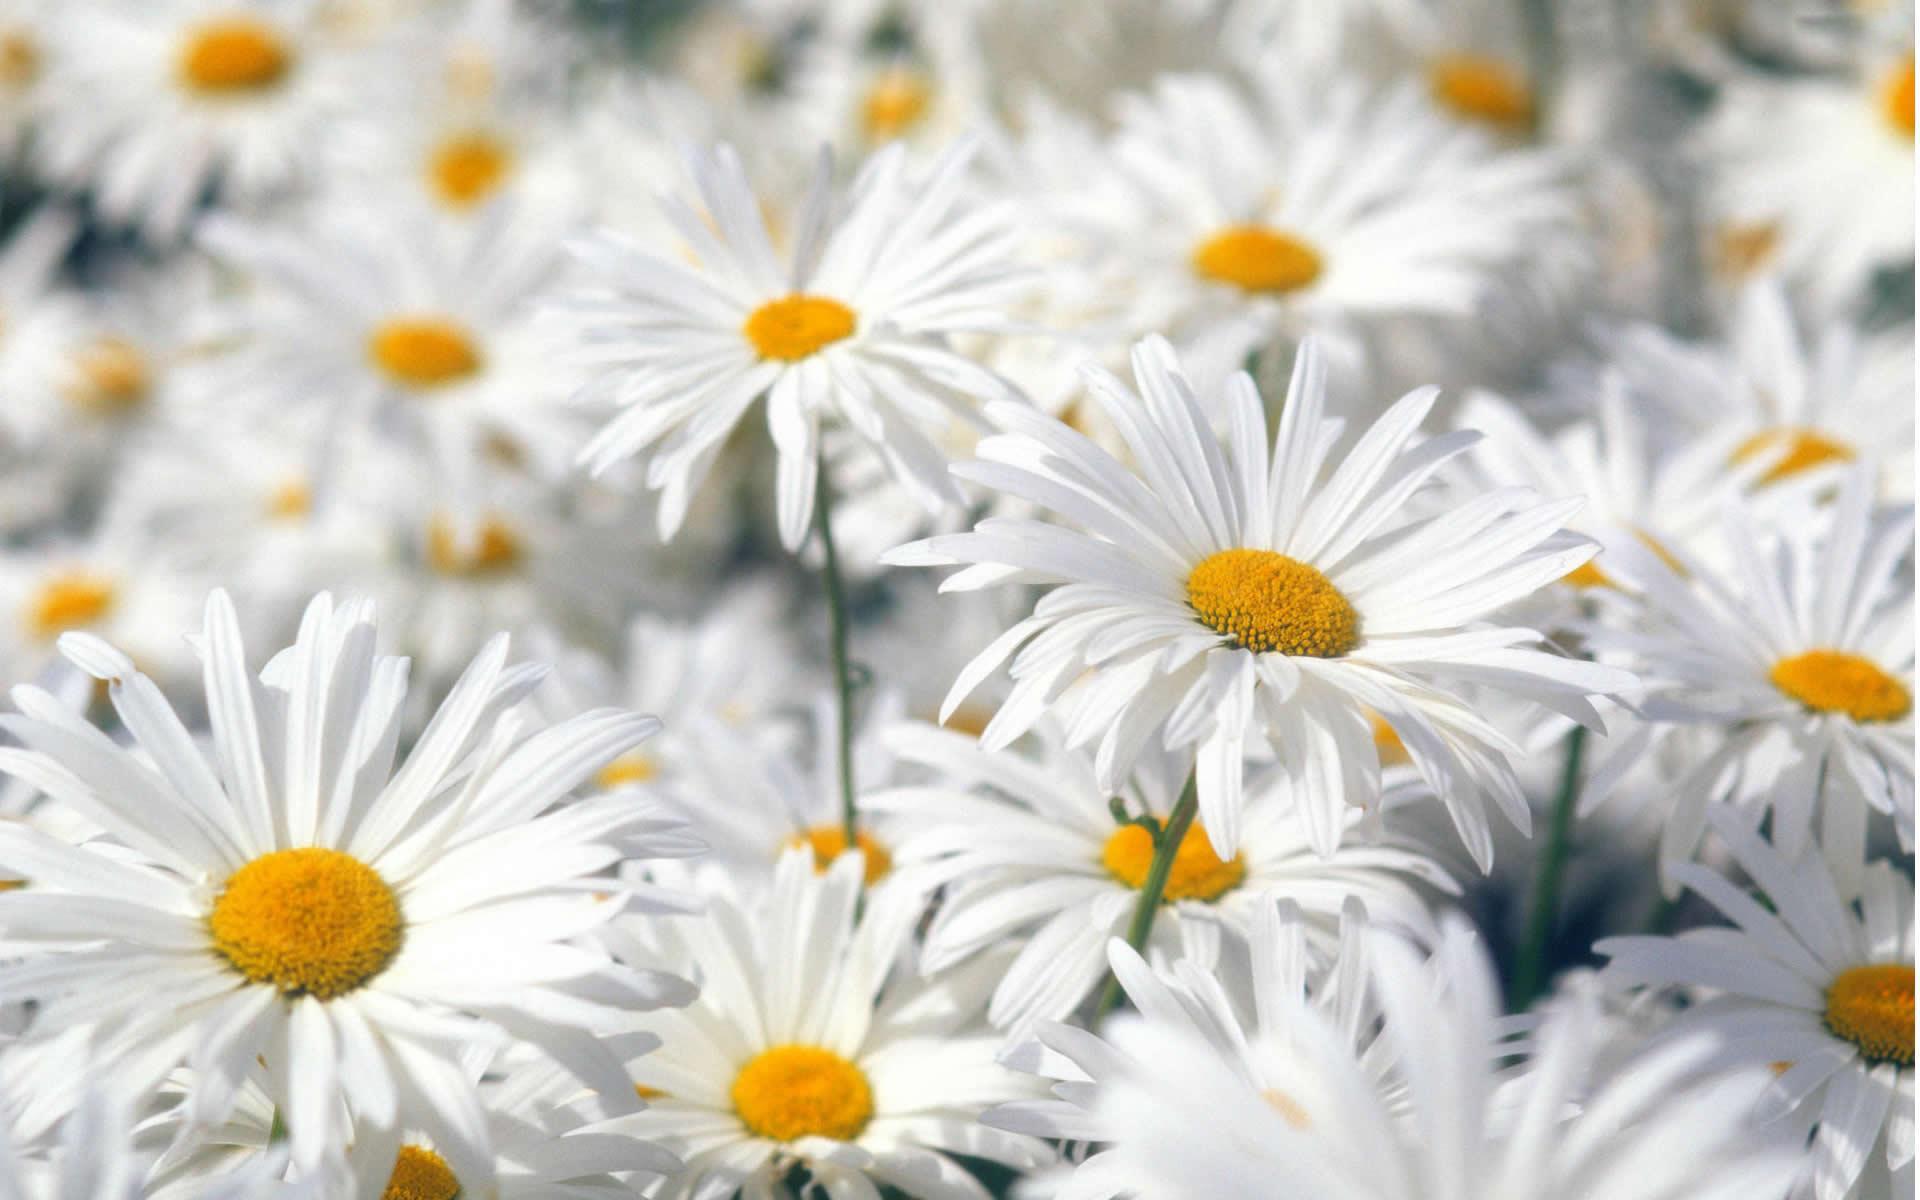 Top Collection of Spring Wallpapers, Spring Desktop Wallpaper Free .